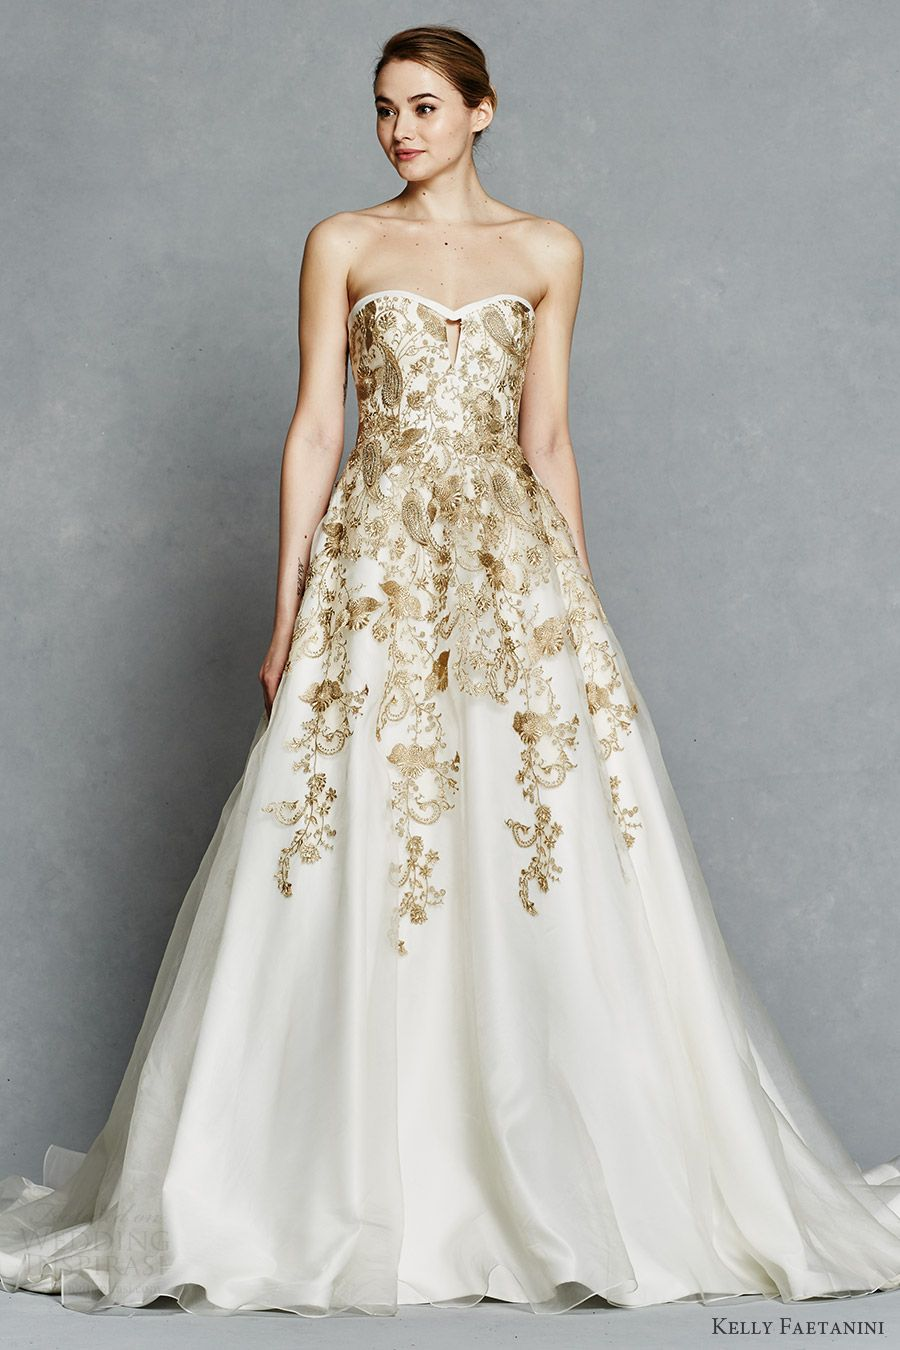 Sweetheart ball gown wedding dress  Kelly Faetanini Spring  Wedding Dresses  Pinterest  Ball gowns